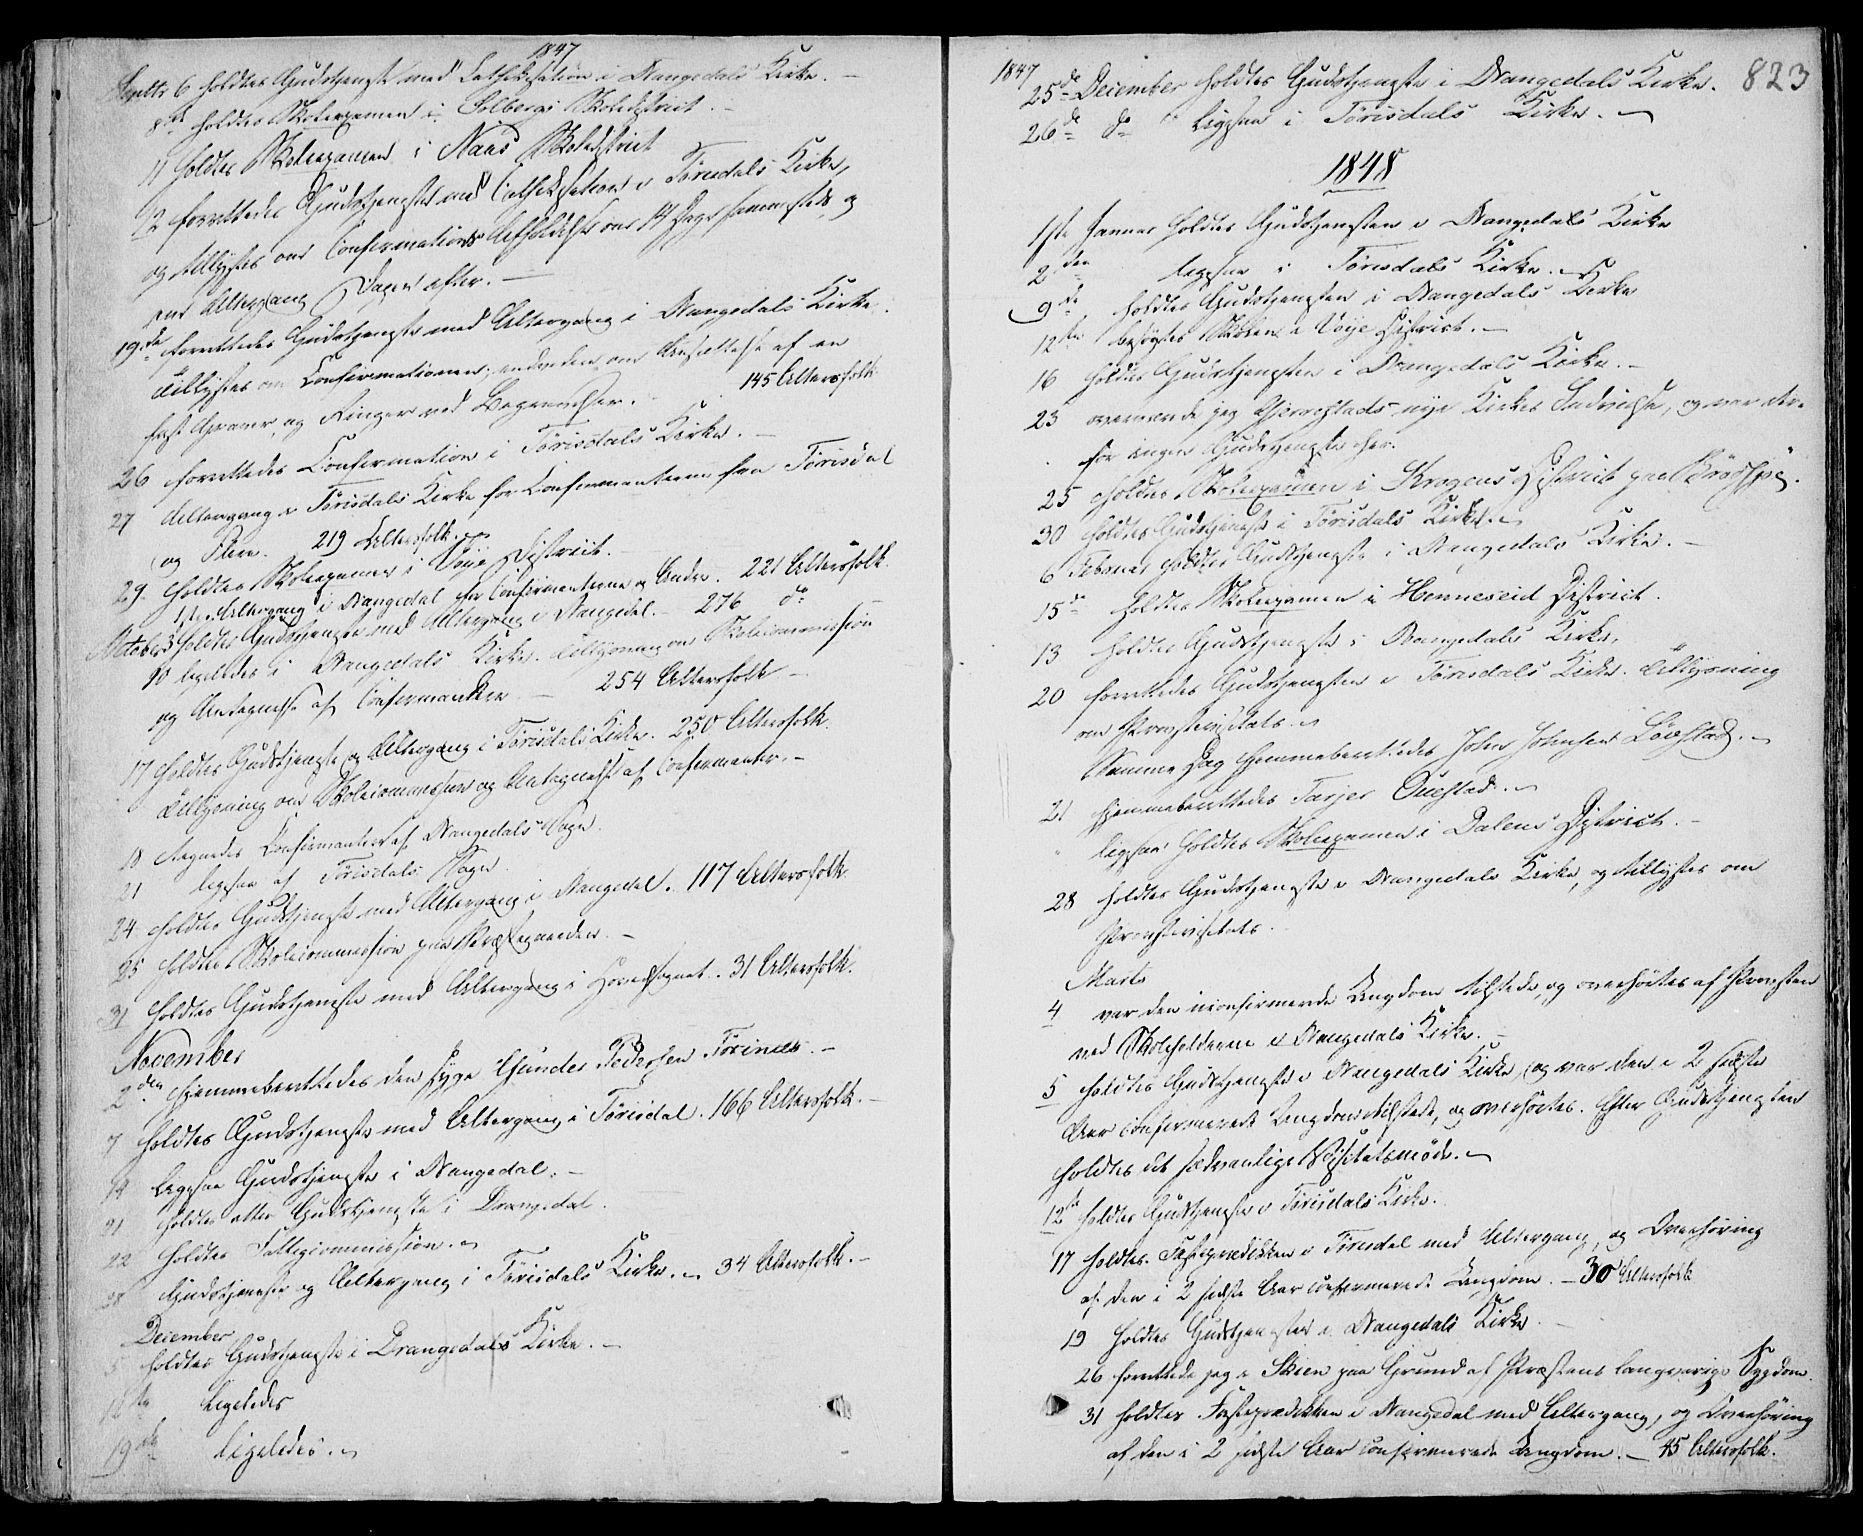 SAKO, Drangedal kirkebøker, F/Fa/L0007b: Ministerialbok nr. 7b, 1837-1856, s. 823